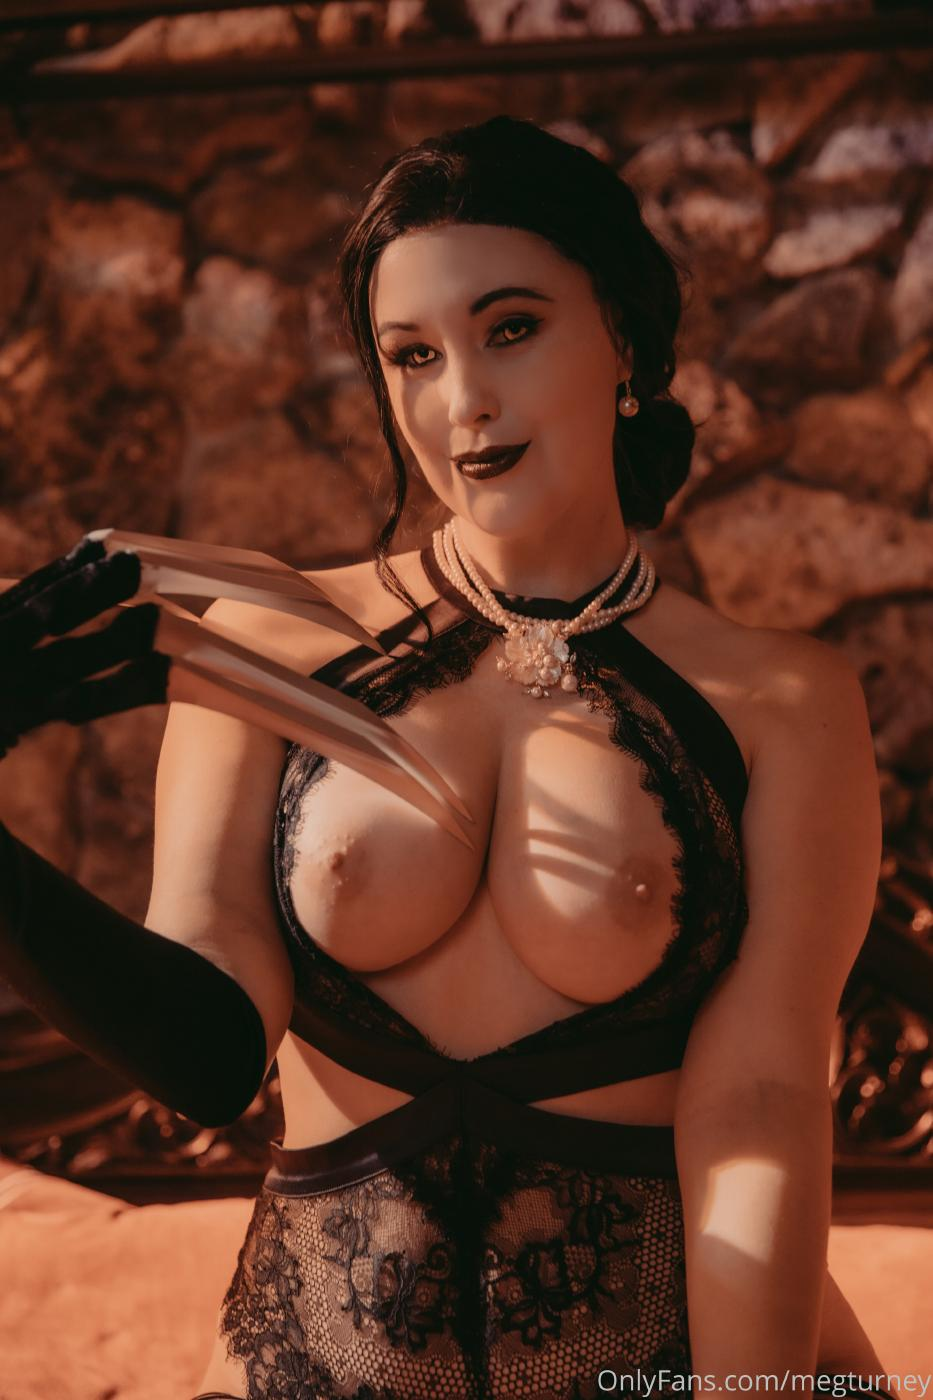 Meg Turney Lady Dimitrescu Cosplay Onlyfans Set Leaked 0015